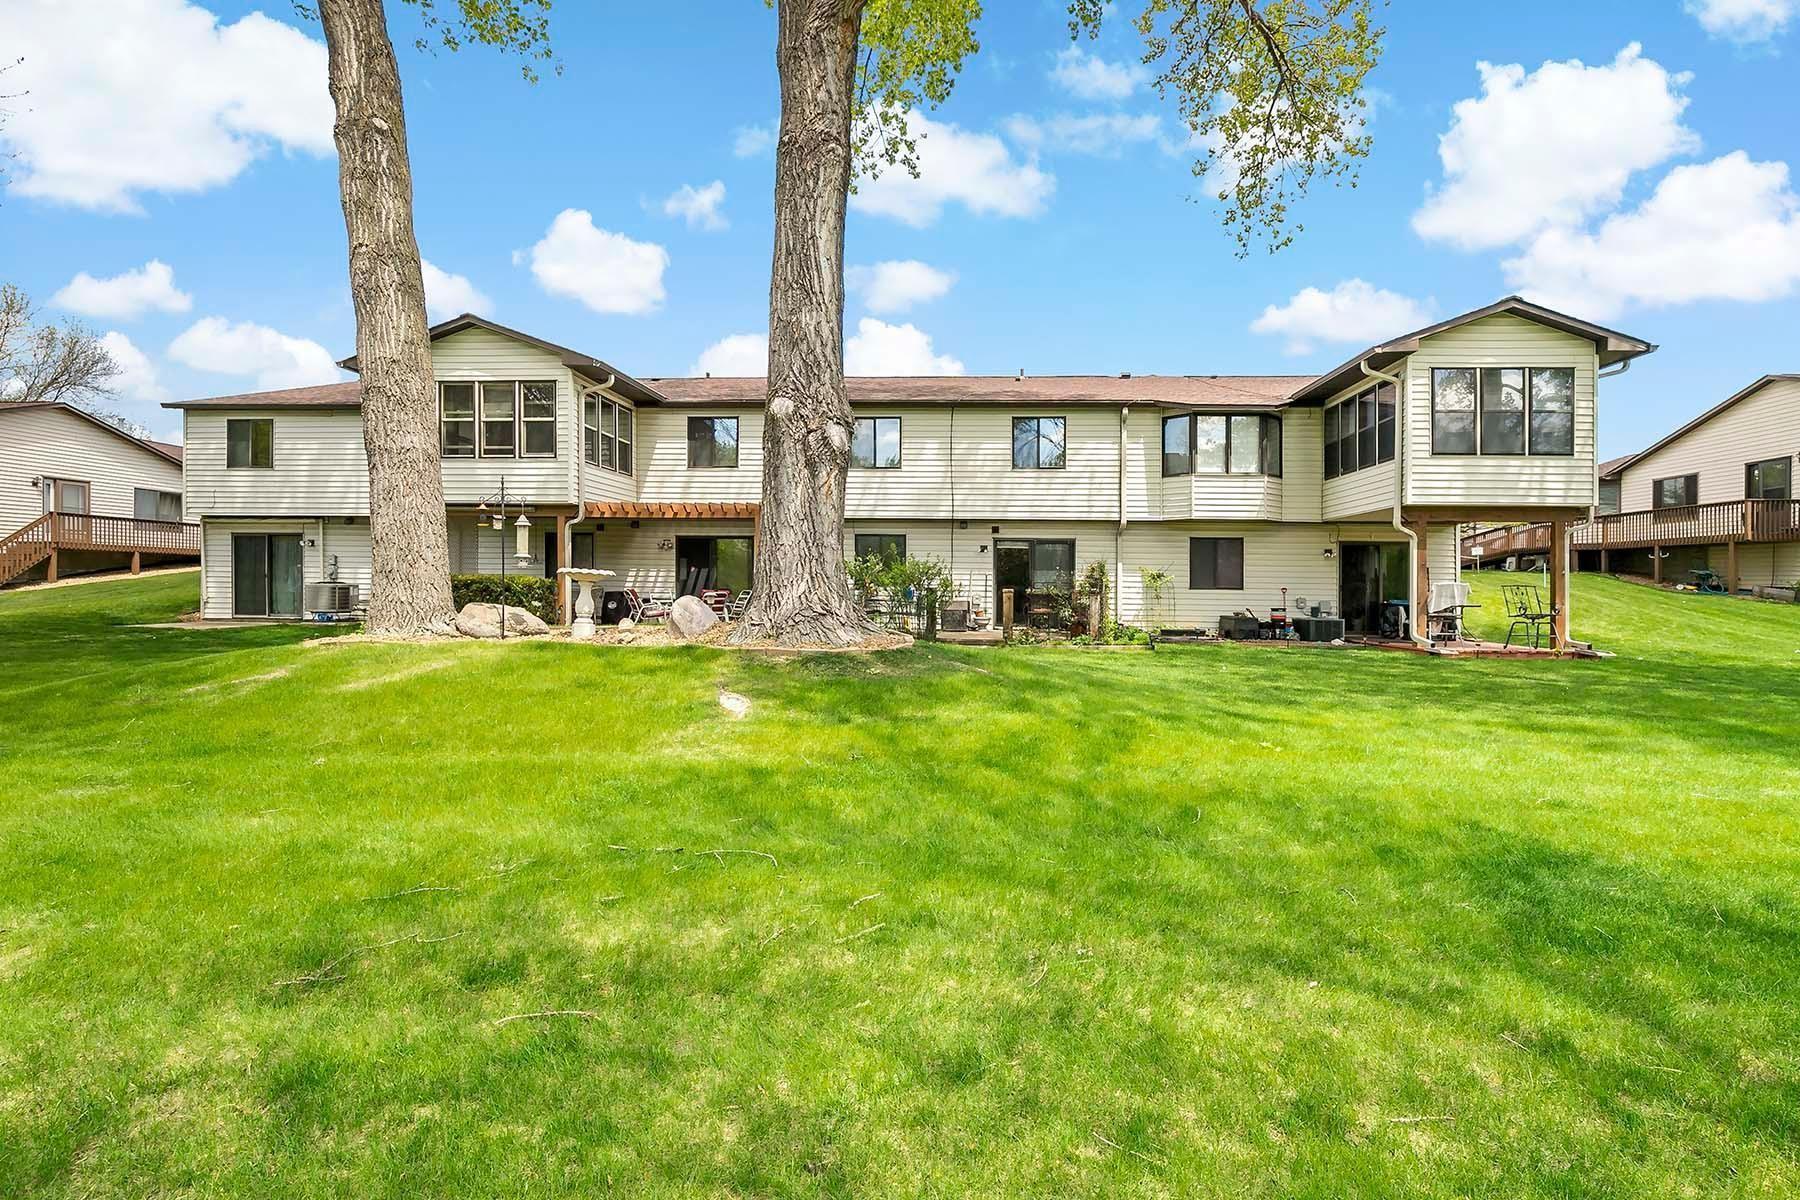 Photo of 14367 Glenda Drive, Apple Valley, MN 55124 (MLS # 5746798)